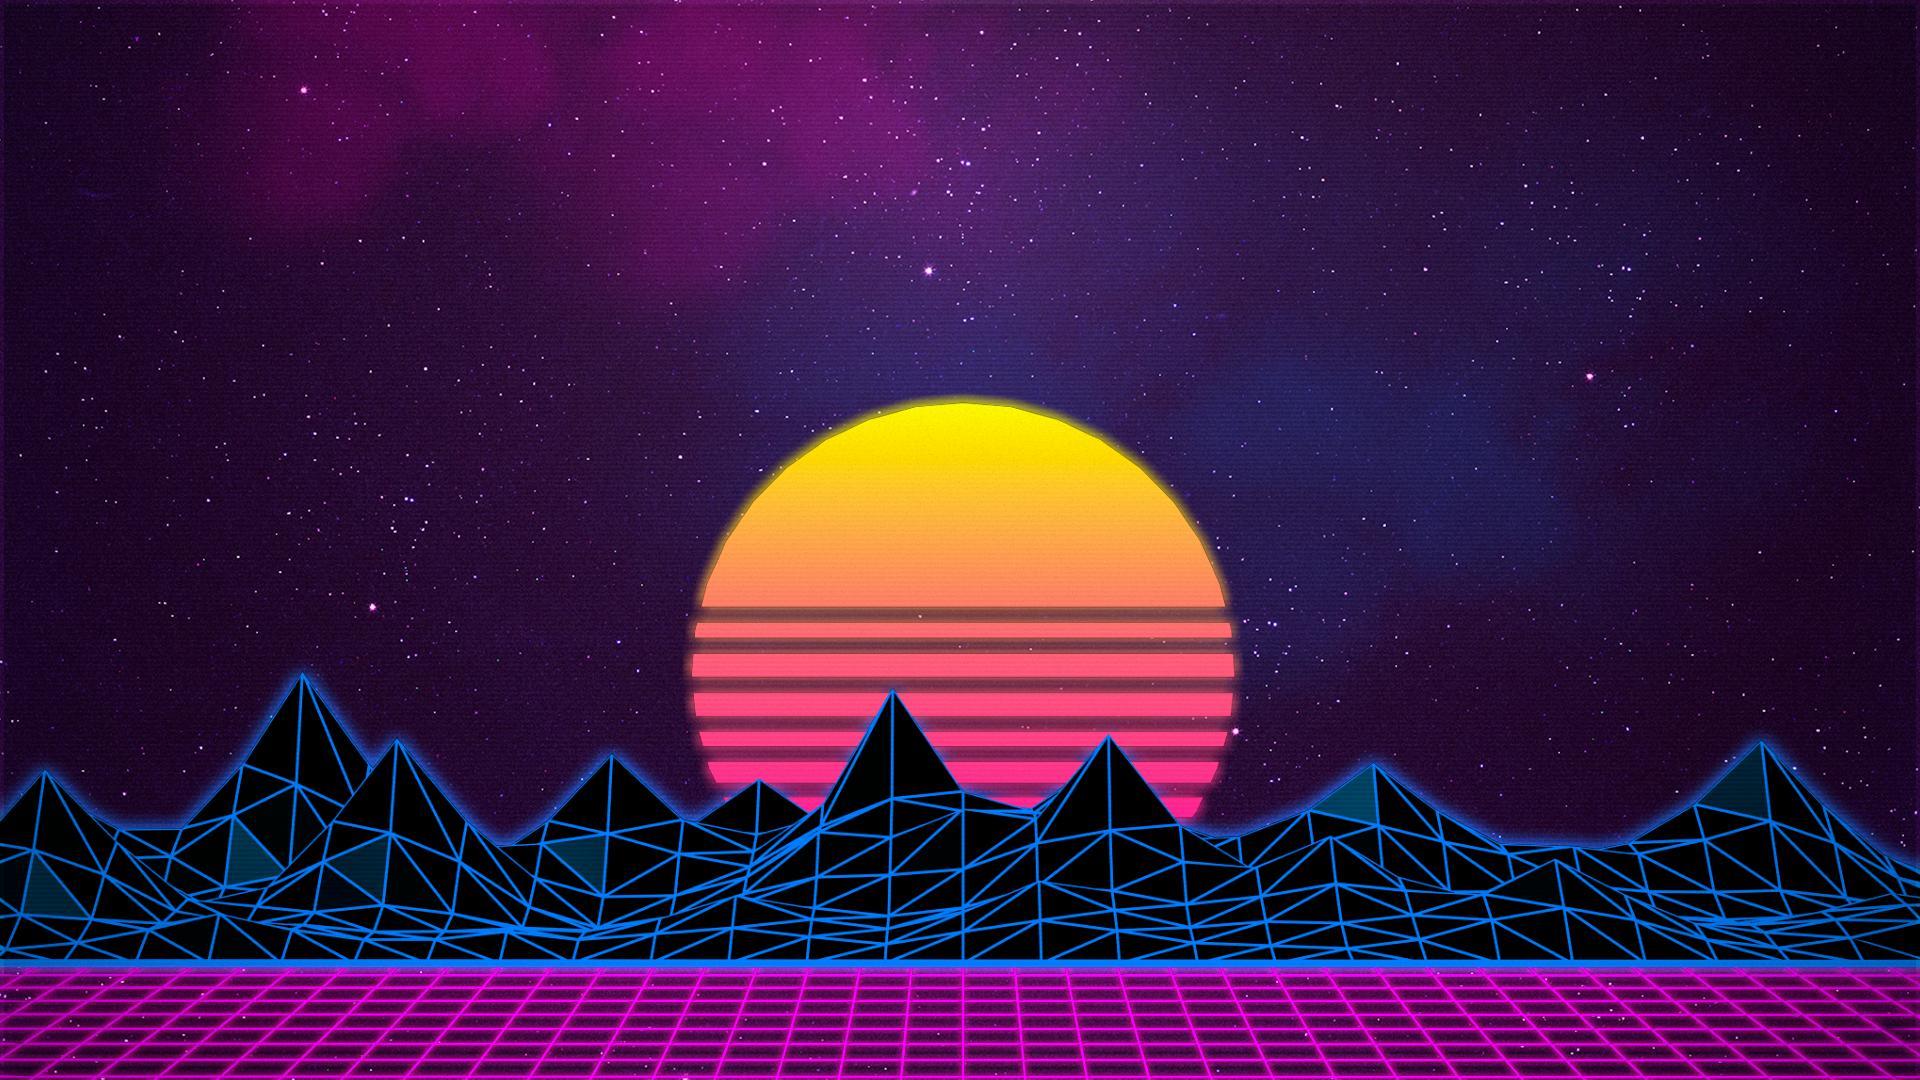 Best 62 Synthwave Wallpaper on HipWallpaper Synthwave Wallpaper 1920x1080